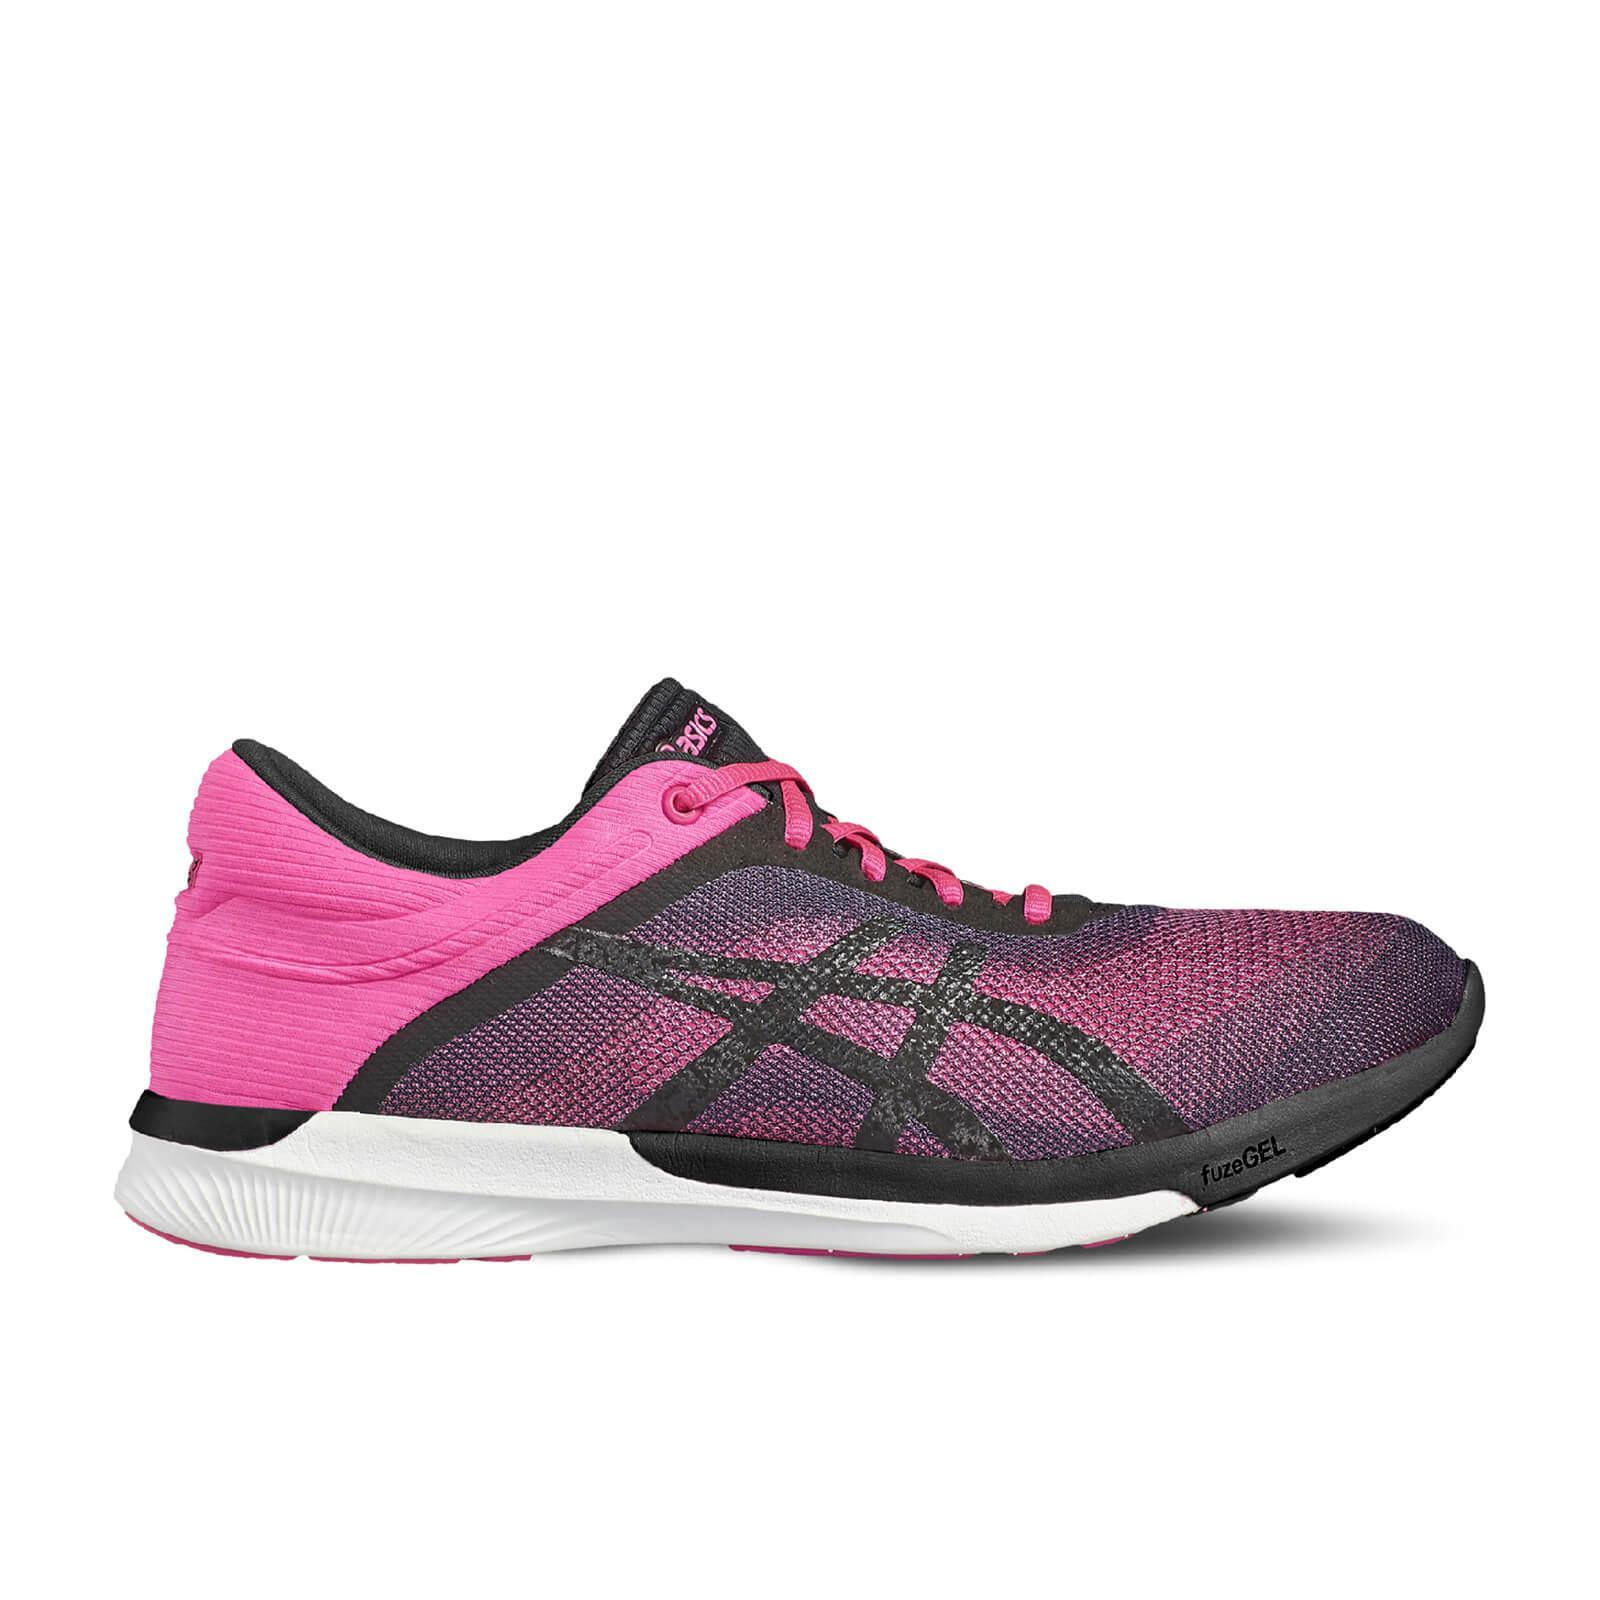 Asics Fuzex Rush Running Shoes